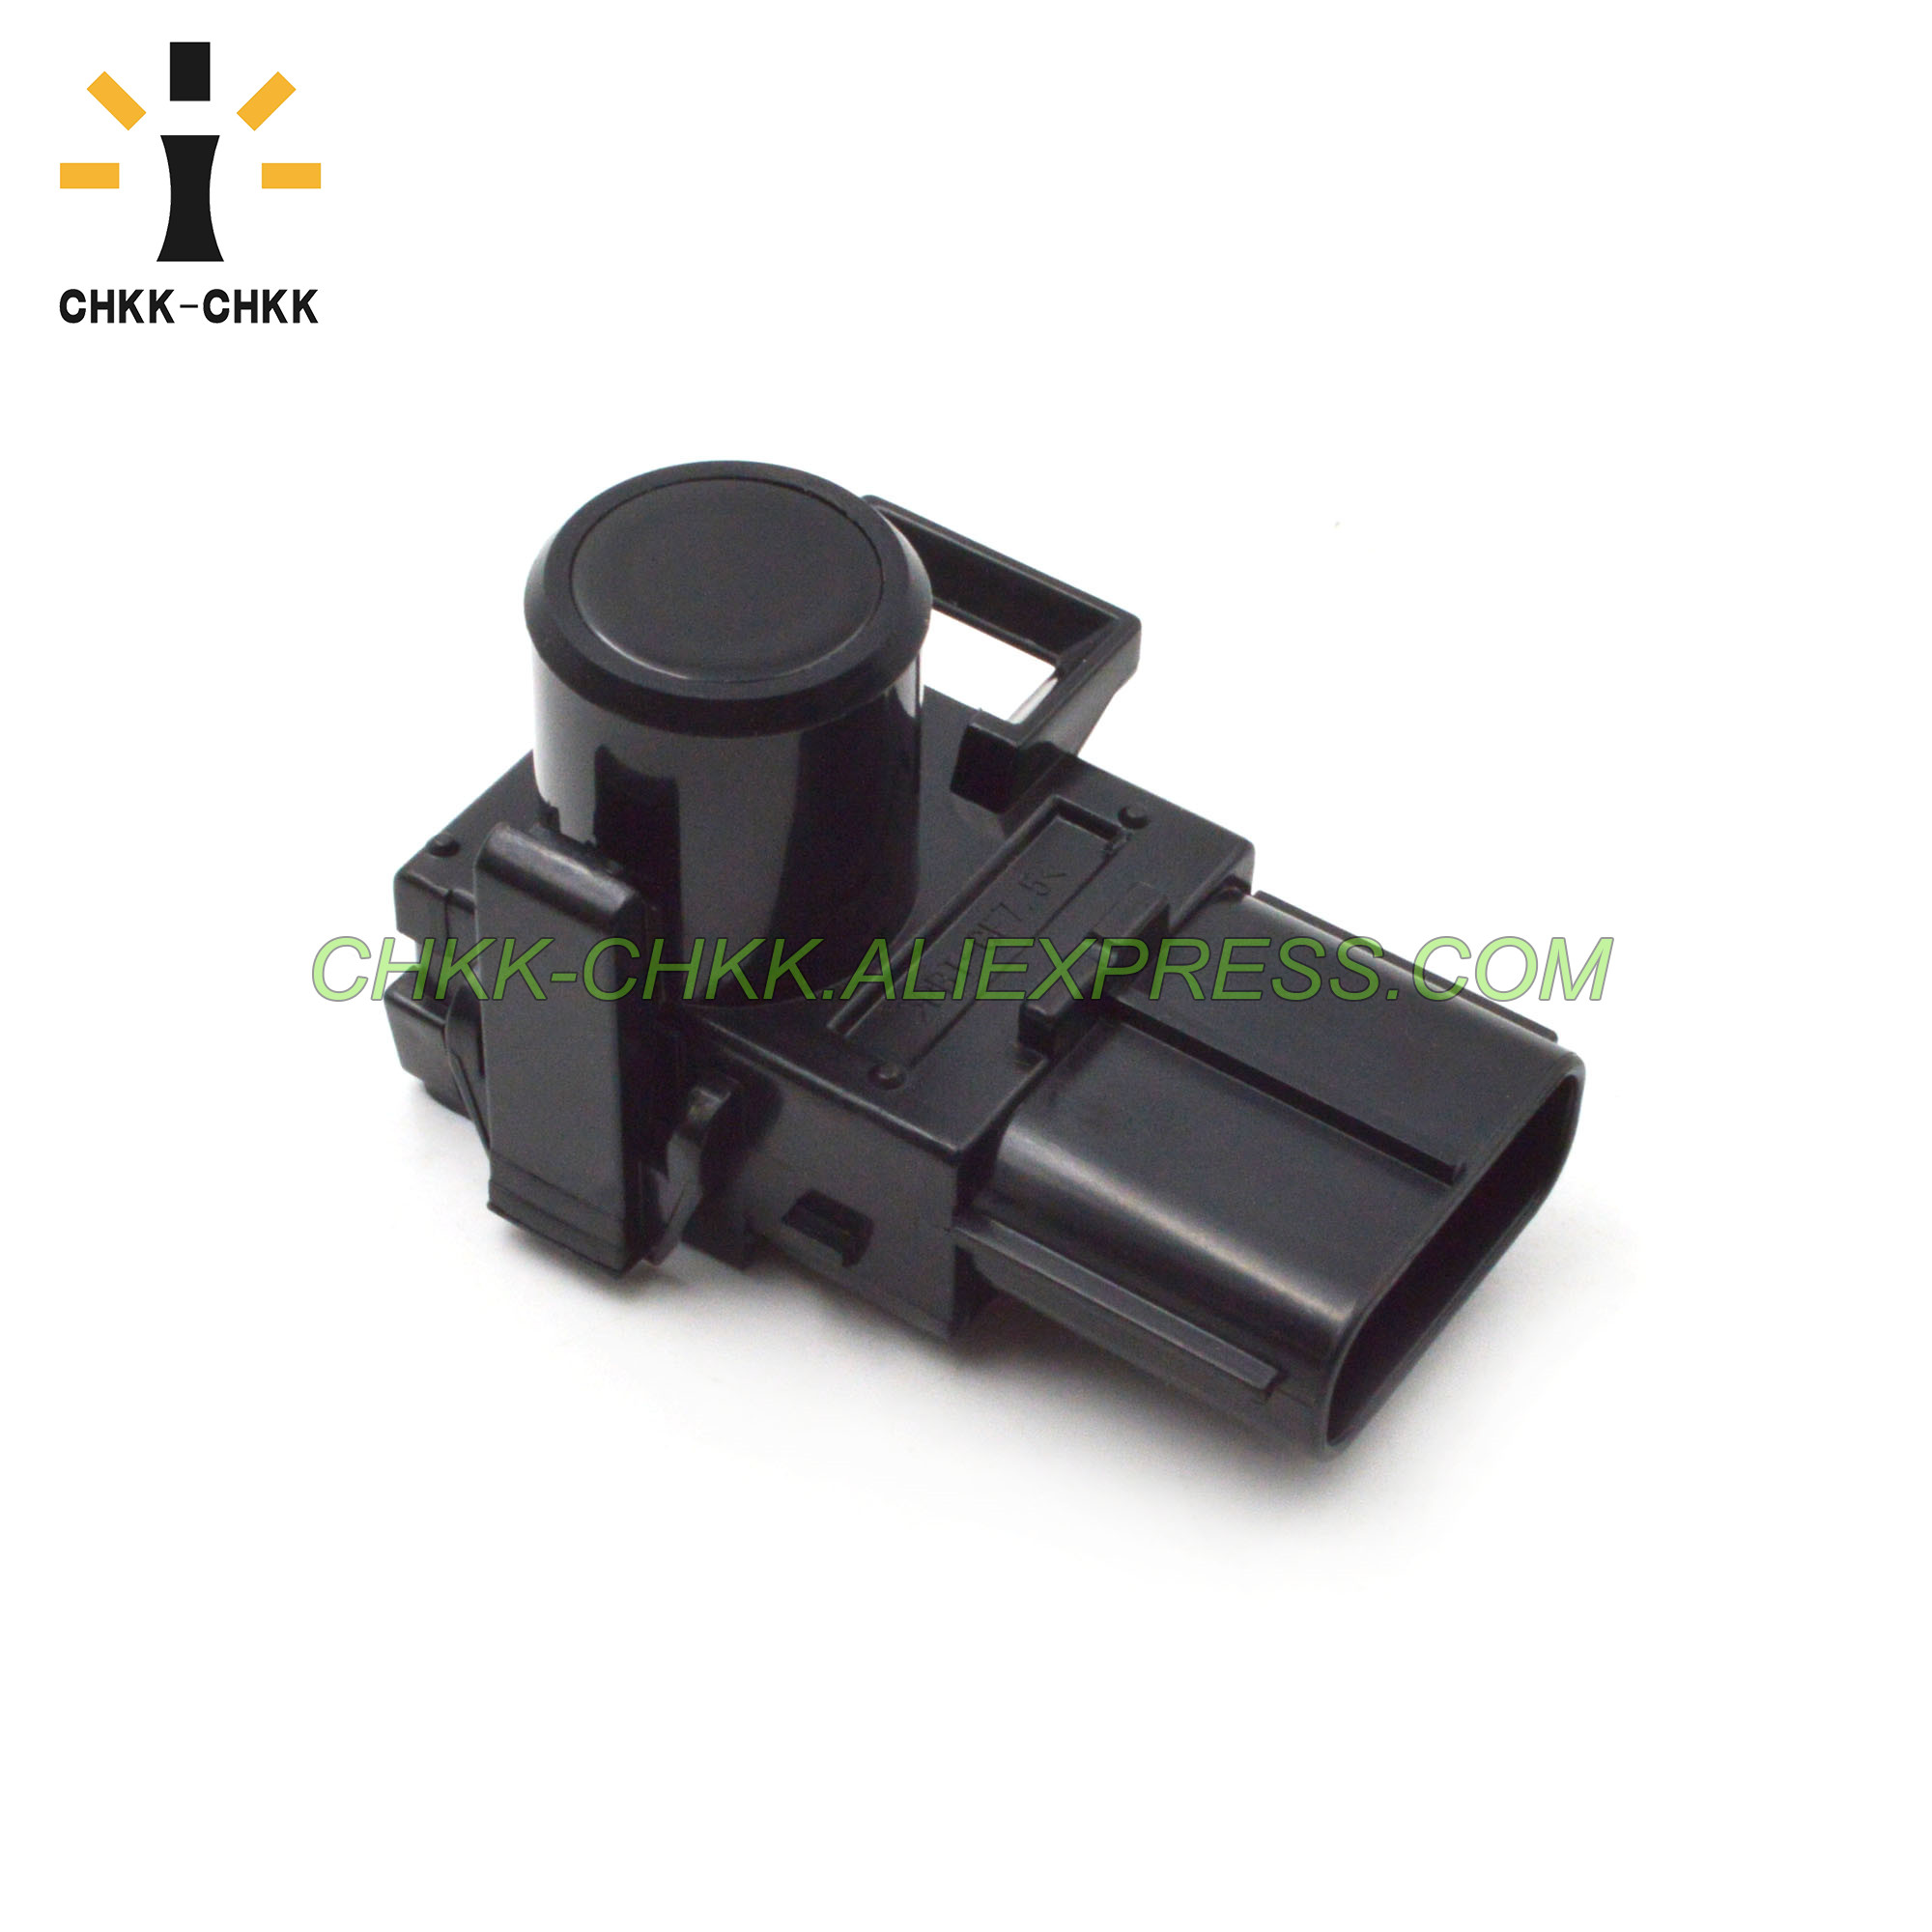 CHKK-CHKK PDC Parksensor Parking Sensor c For Toyota Camry LEXUS GX460 RX350 RX450 8934133160C0